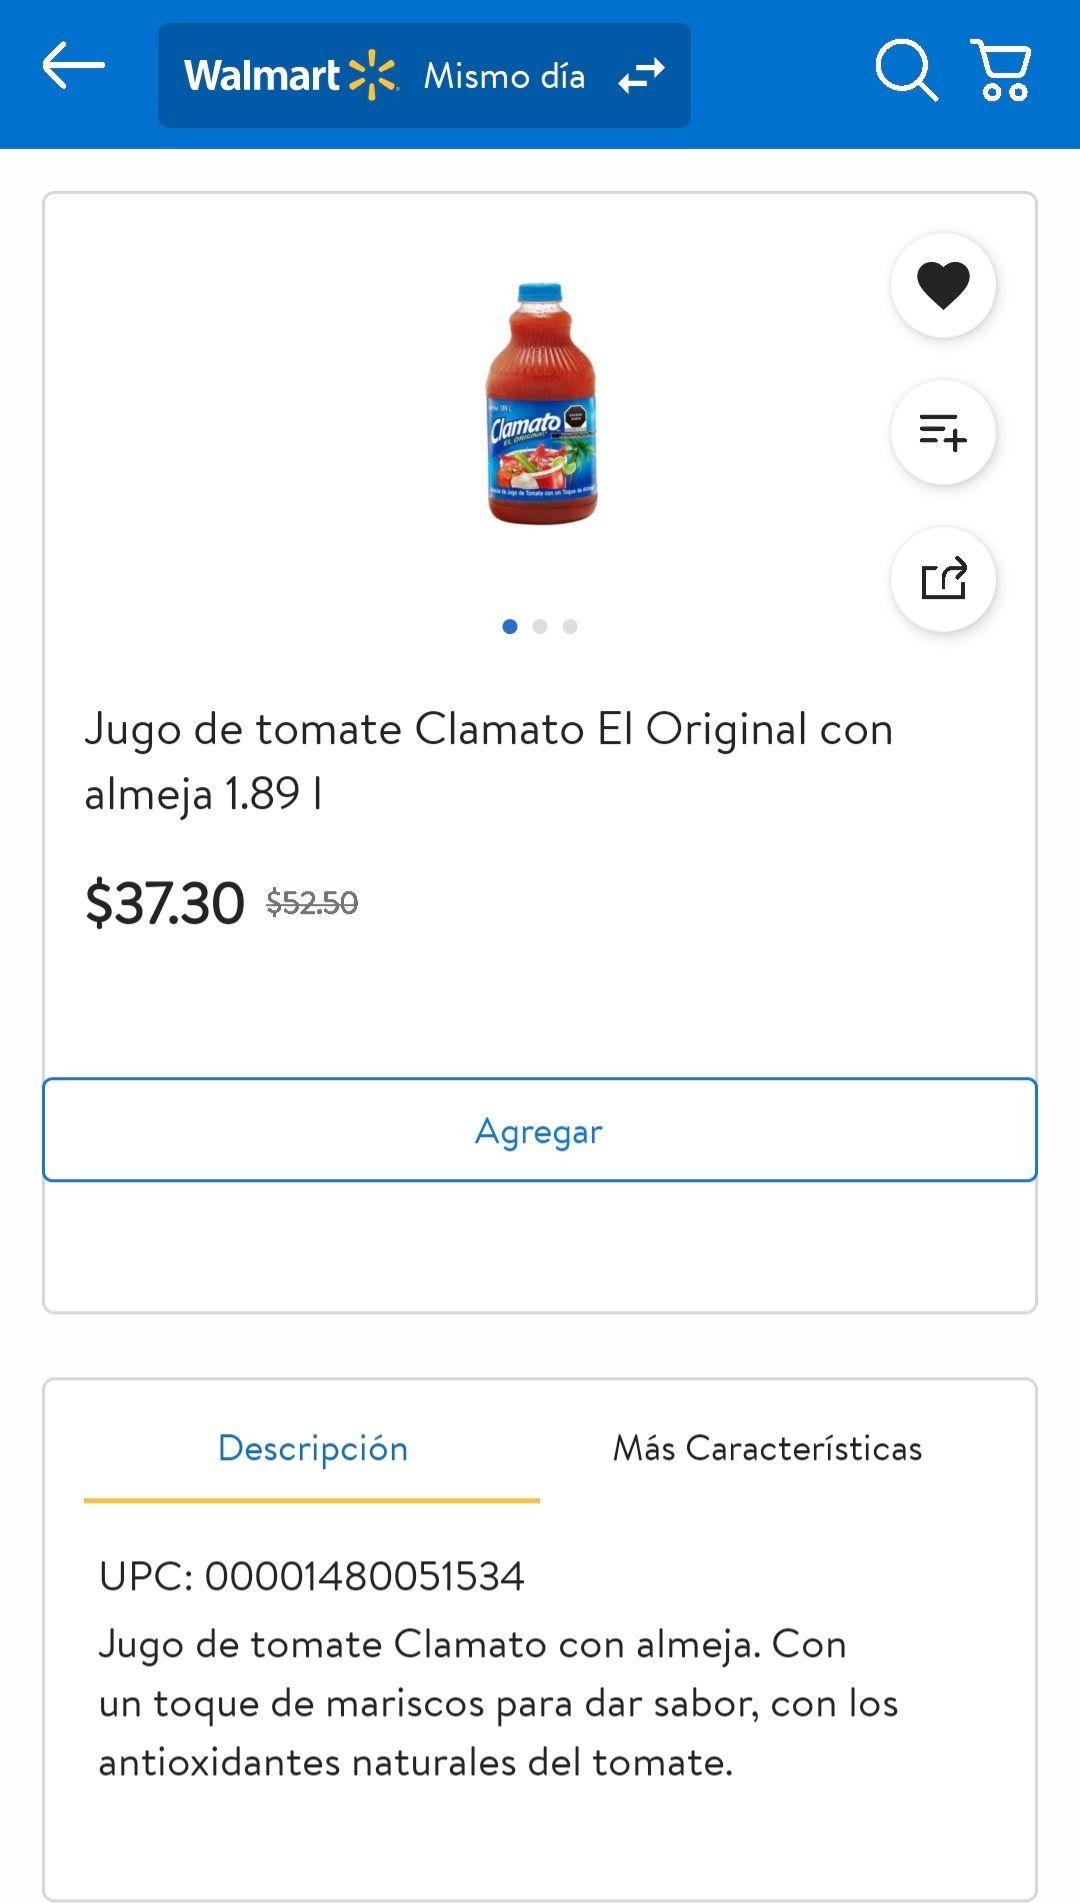 Walmart: Clamato 1.89 lt